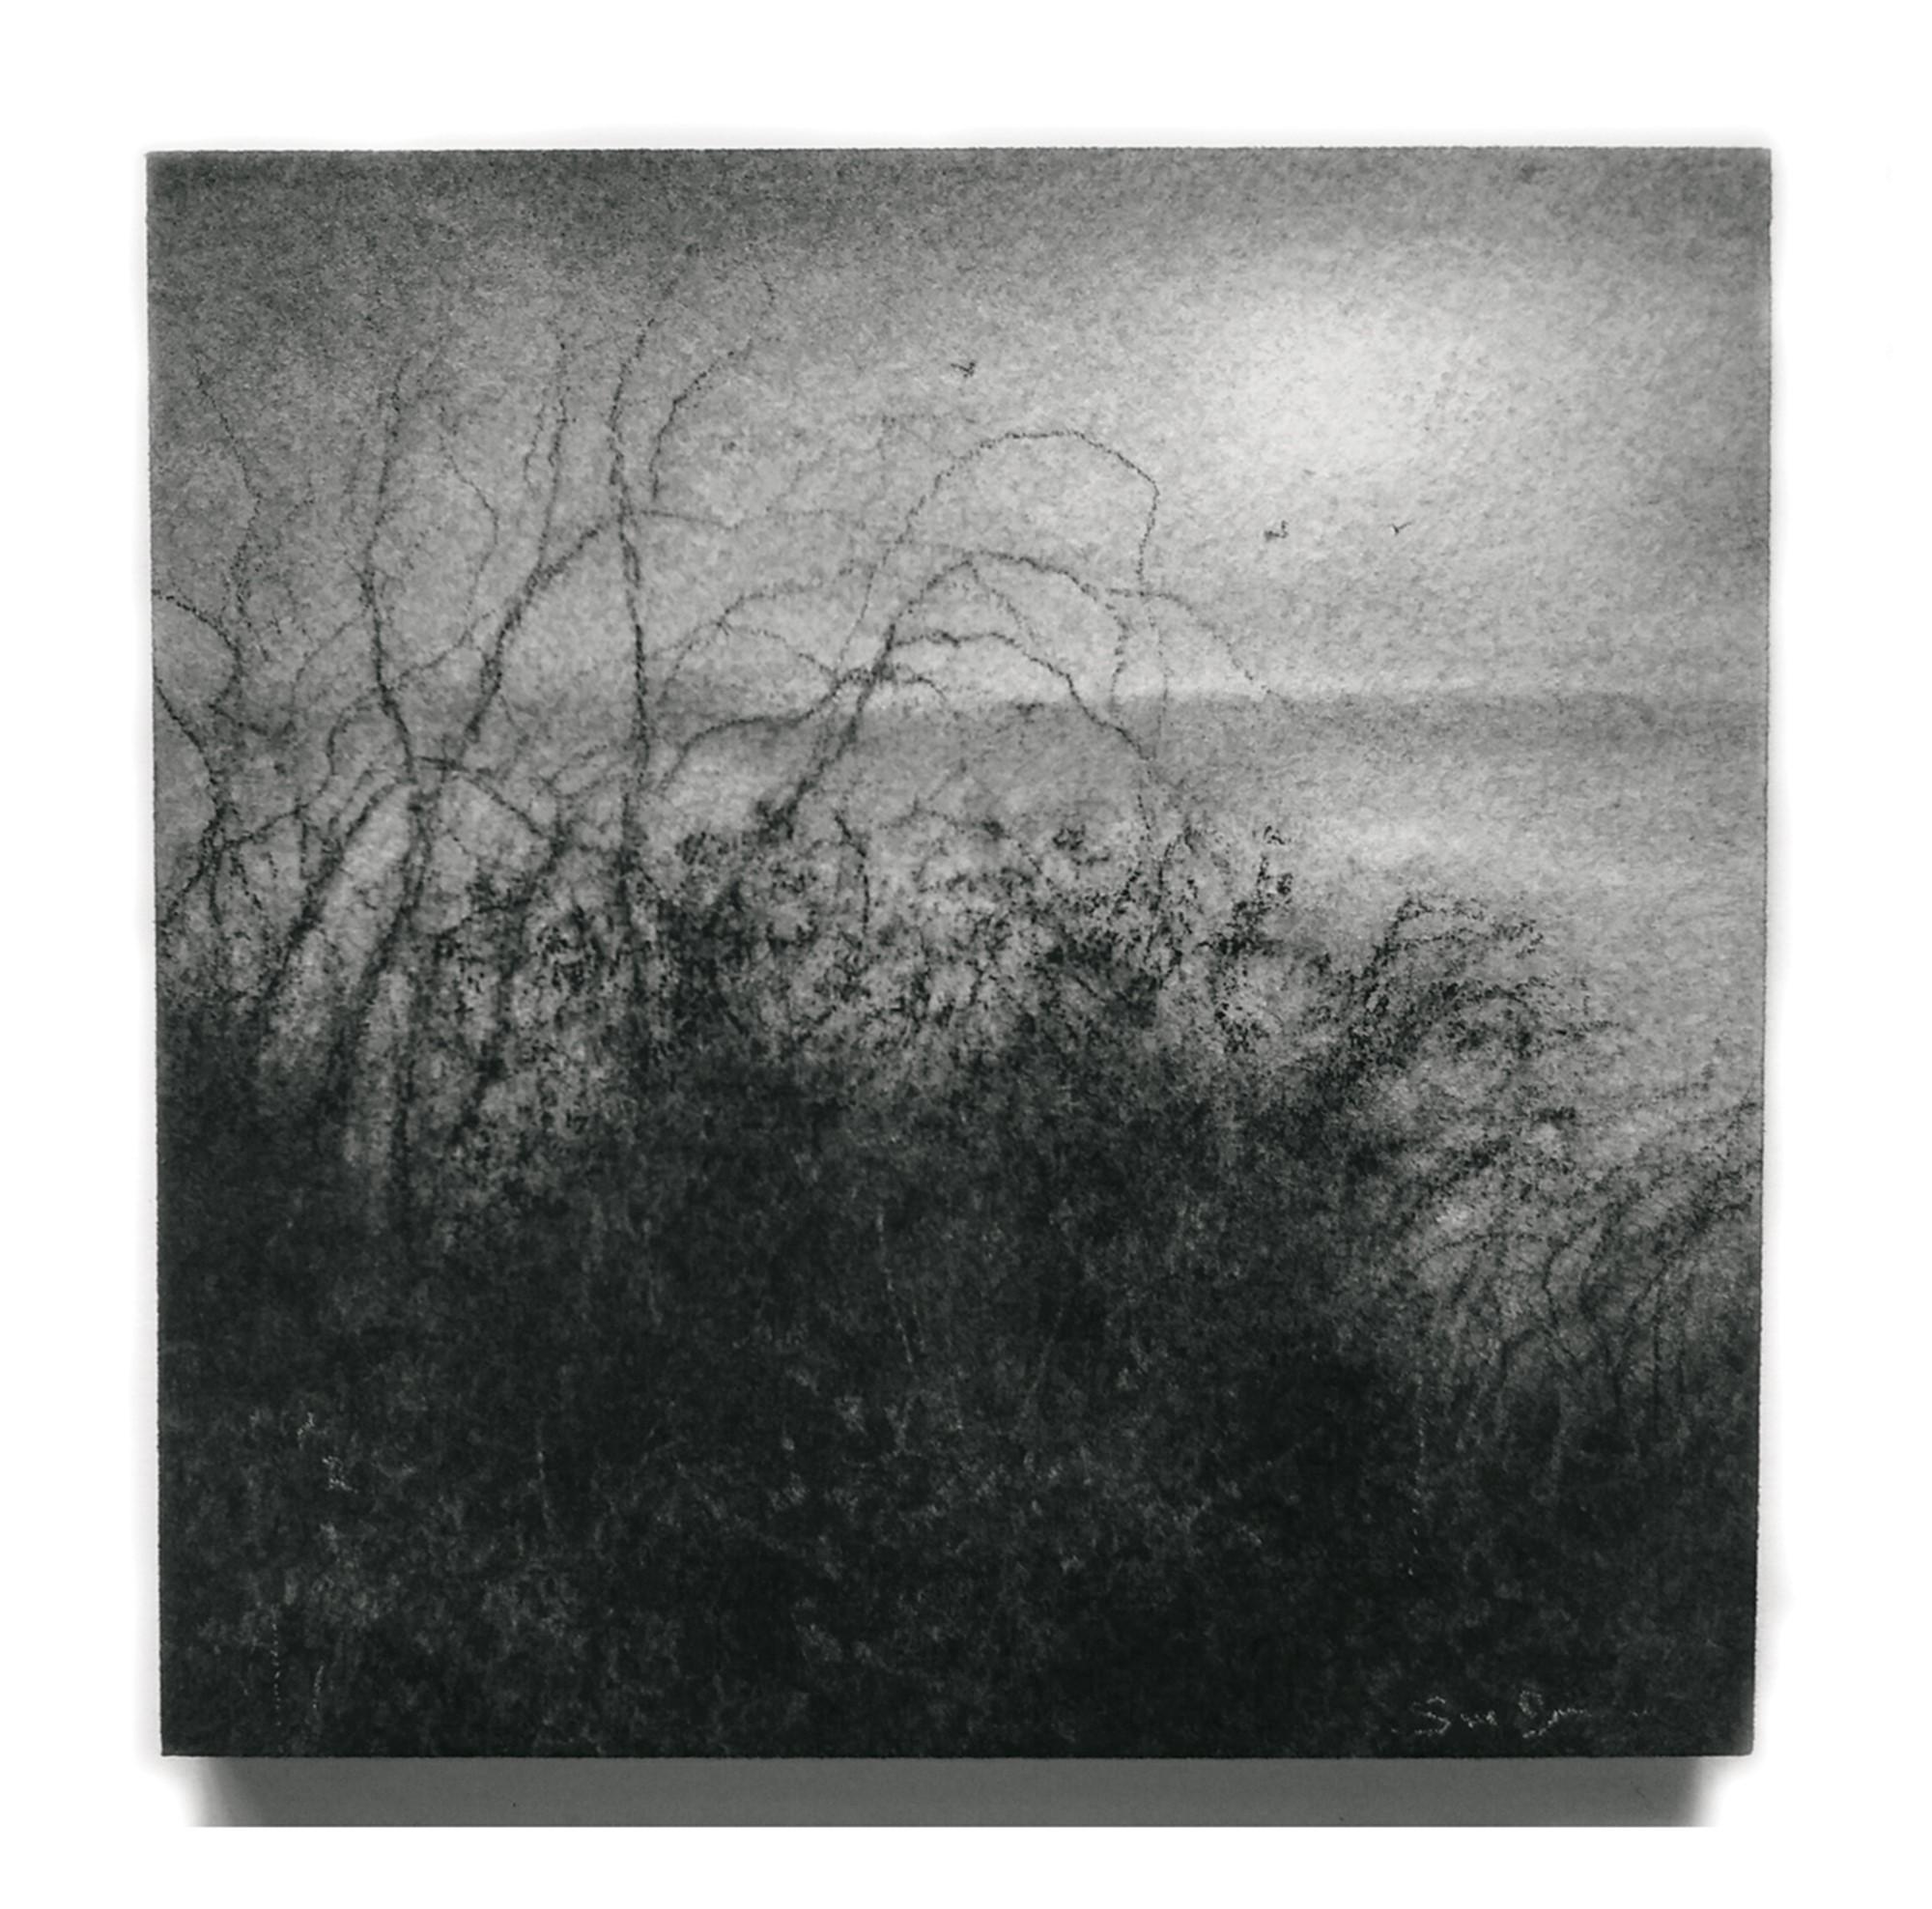 Edgeland XXXIV by Sue Bryan